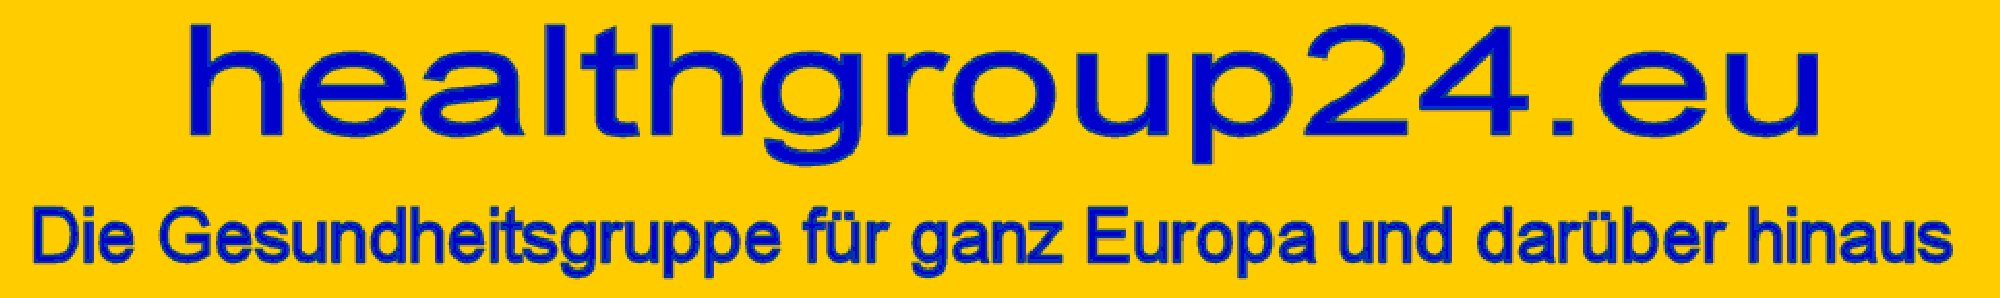 healthgroup24.eu